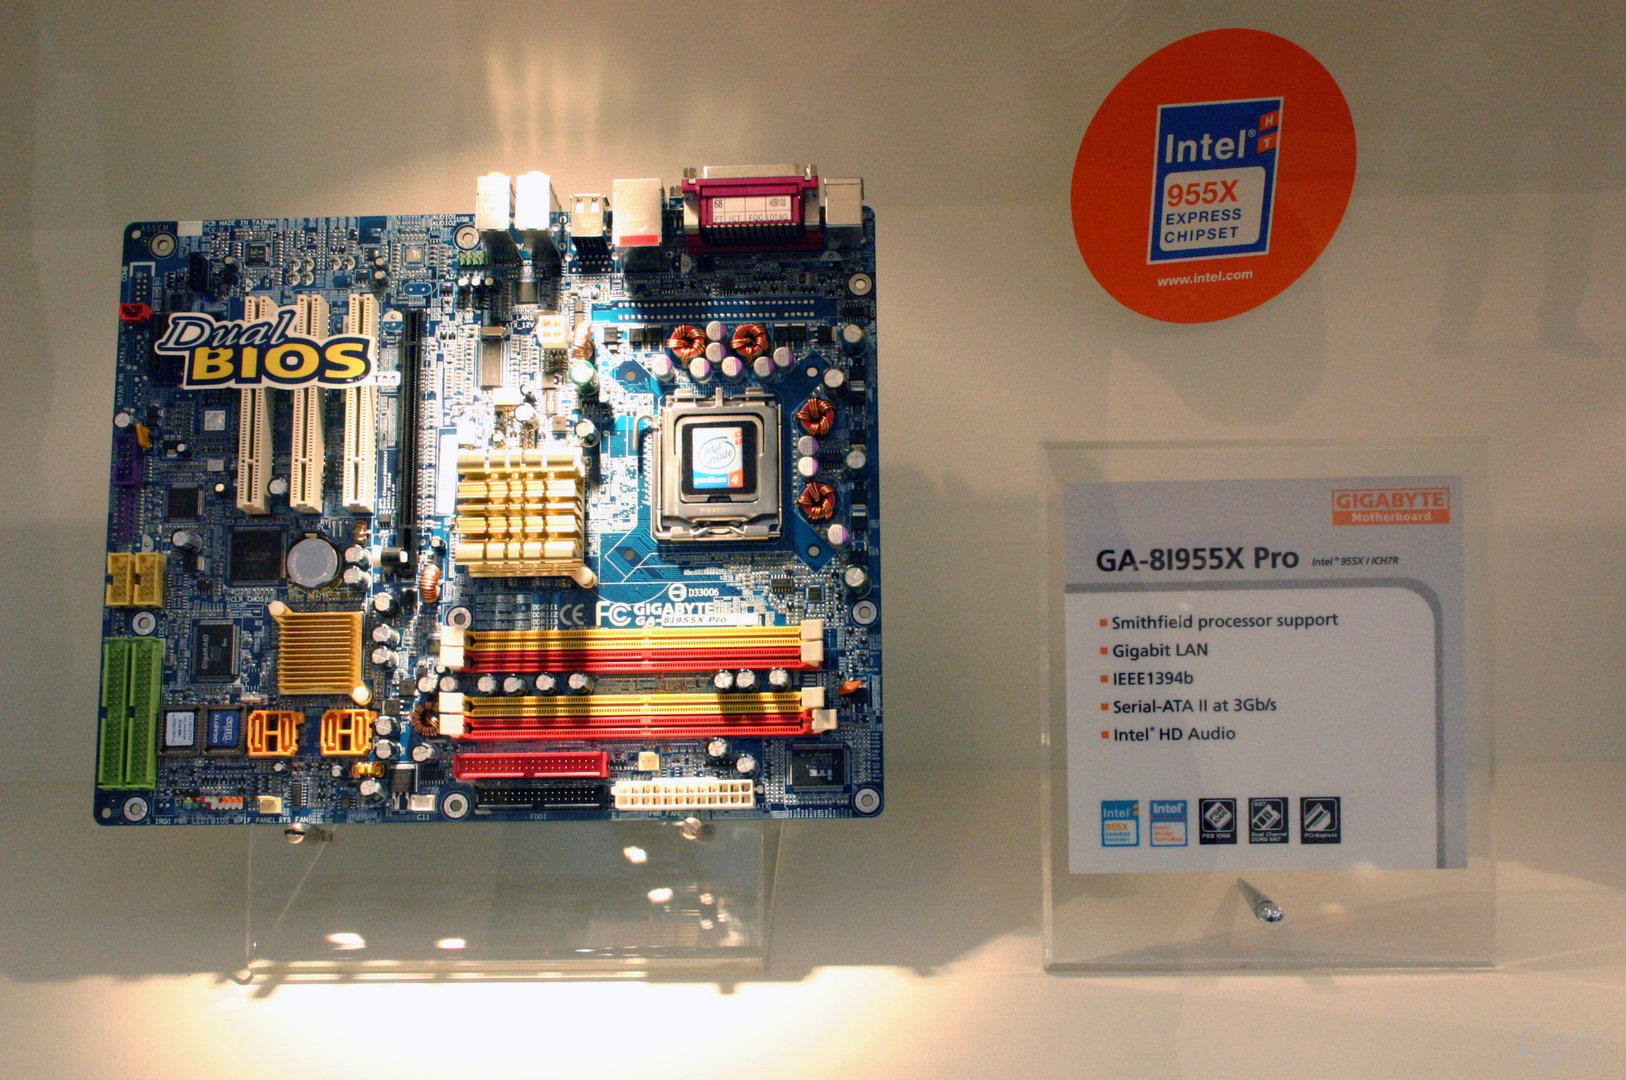 Gigabyte GA-8I955X Pro